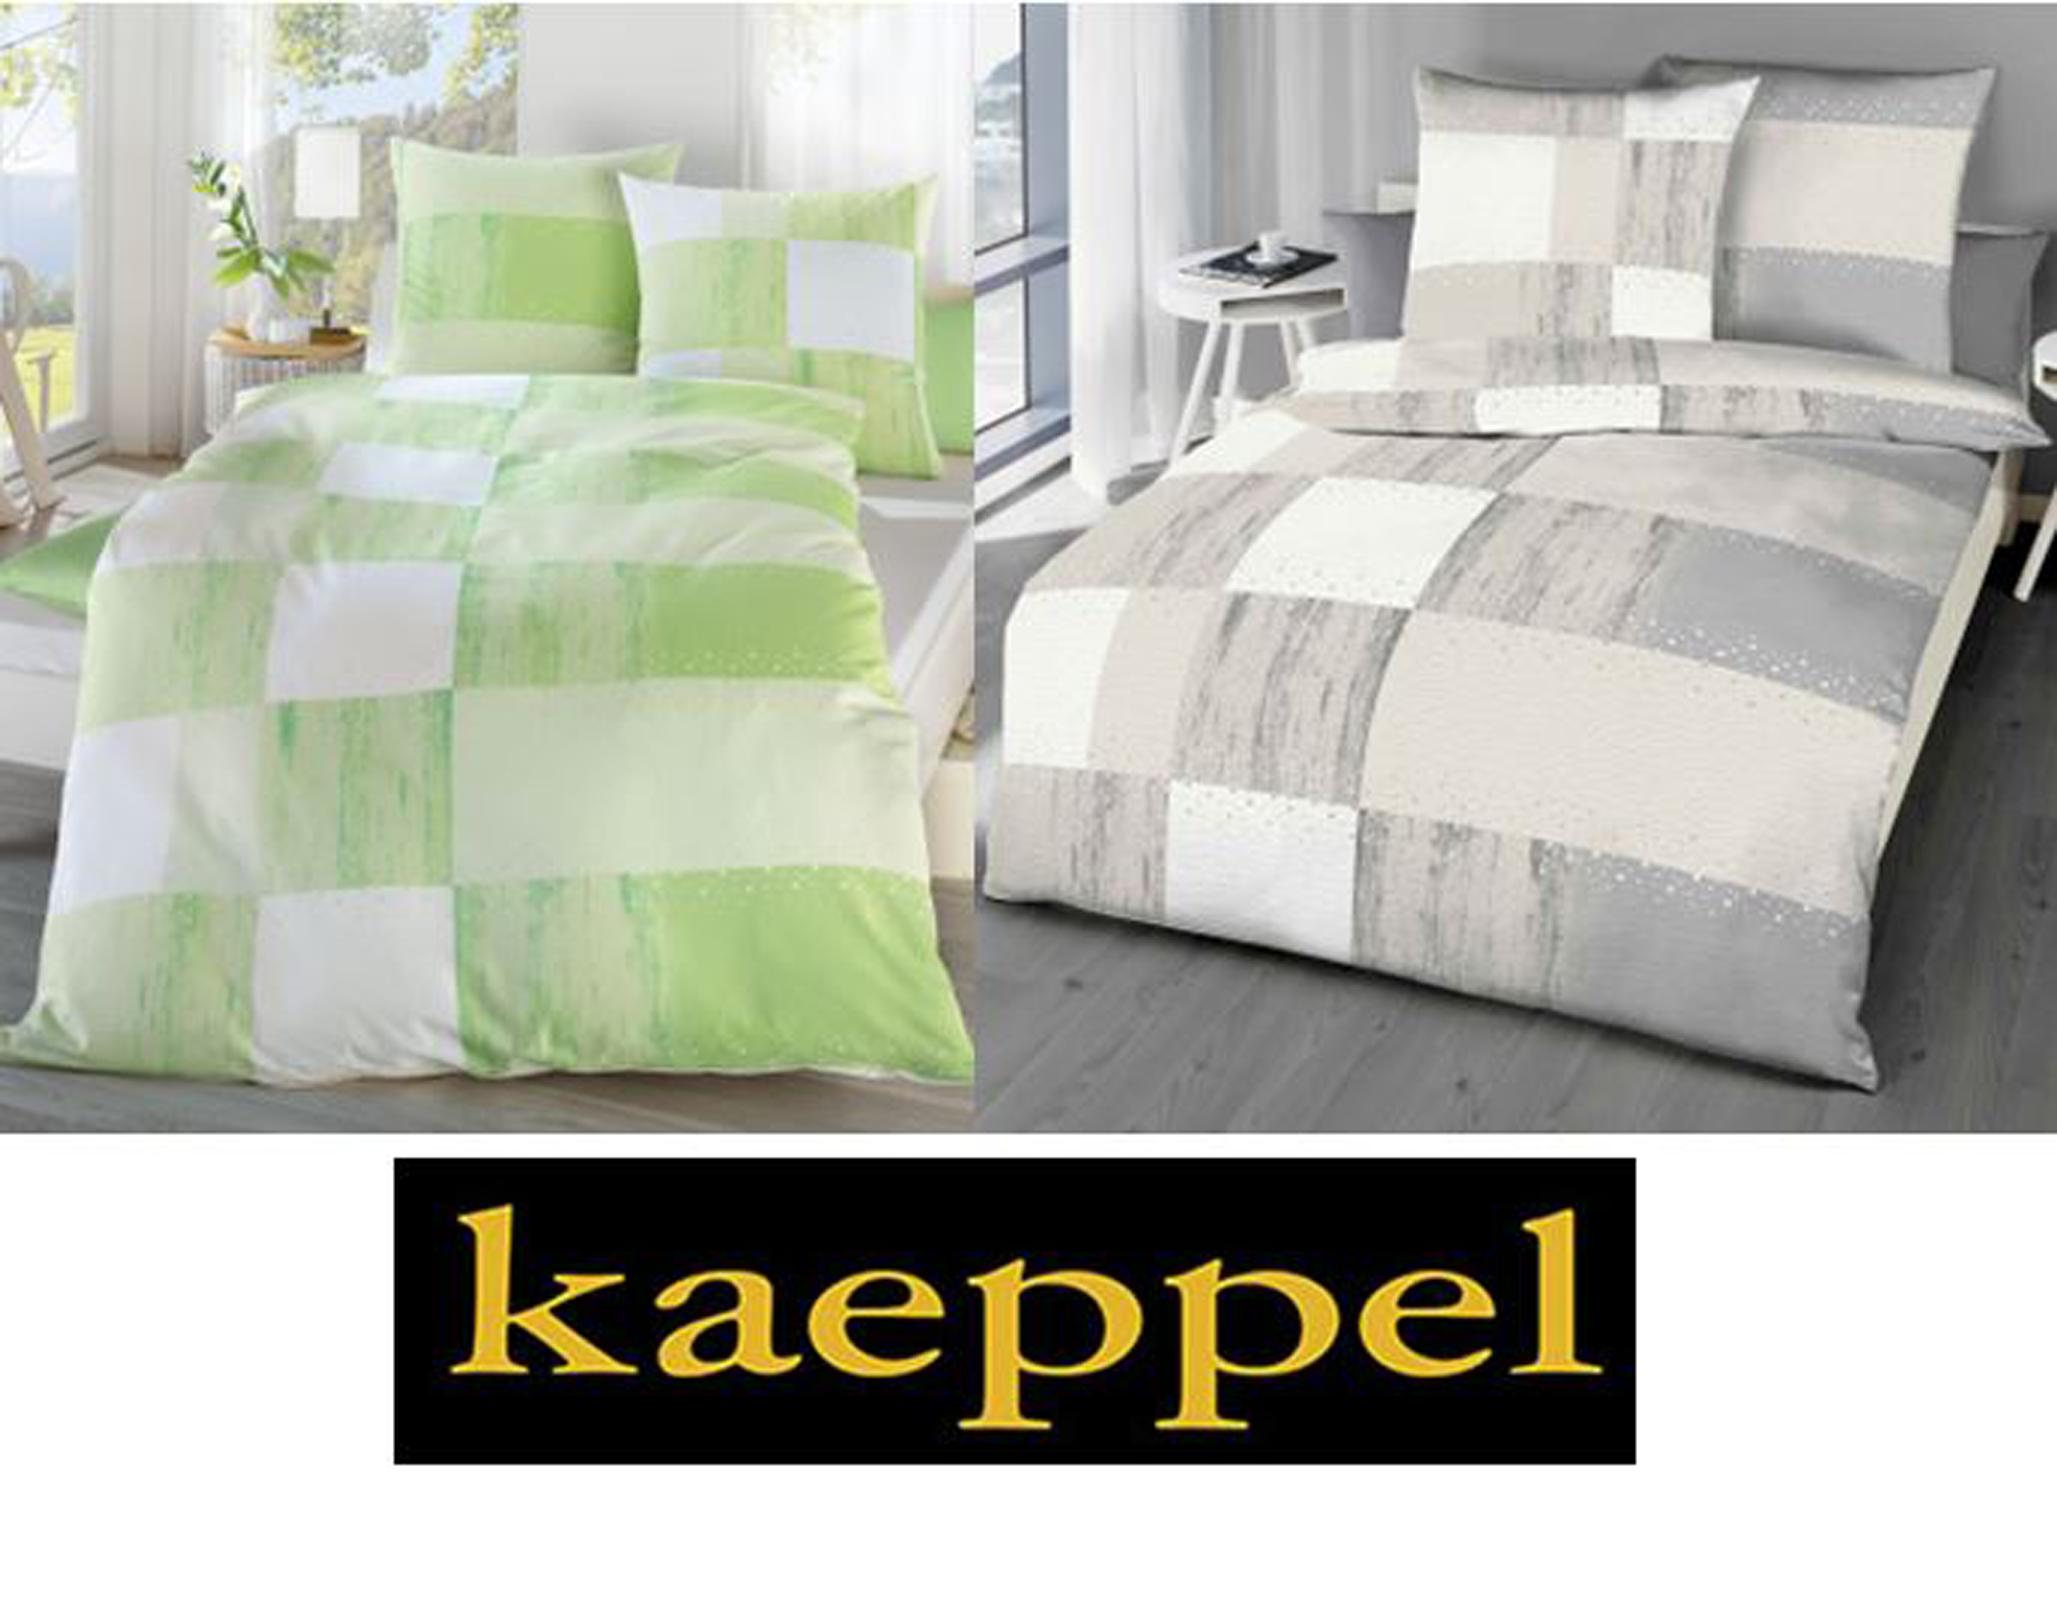 kaeppel seersucker bettw sche clipped 772 incl aufbewahrungsbeutel ebay. Black Bedroom Furniture Sets. Home Design Ideas